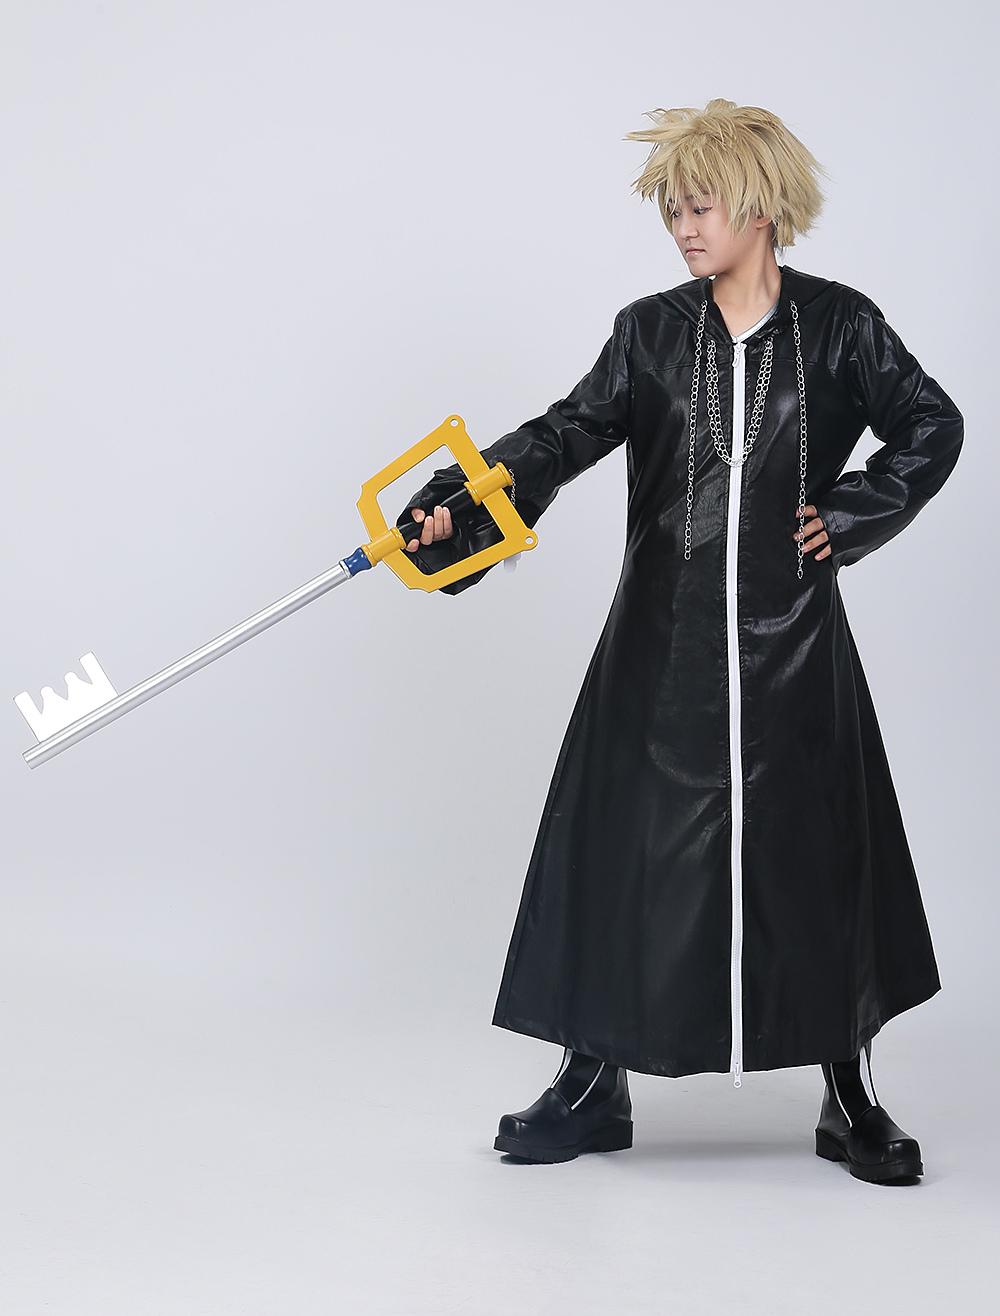 ... Kingdom Hearts Organization XIII Roxas Cosplay Costume Halloween-No.7  ... 56308fa69e9a